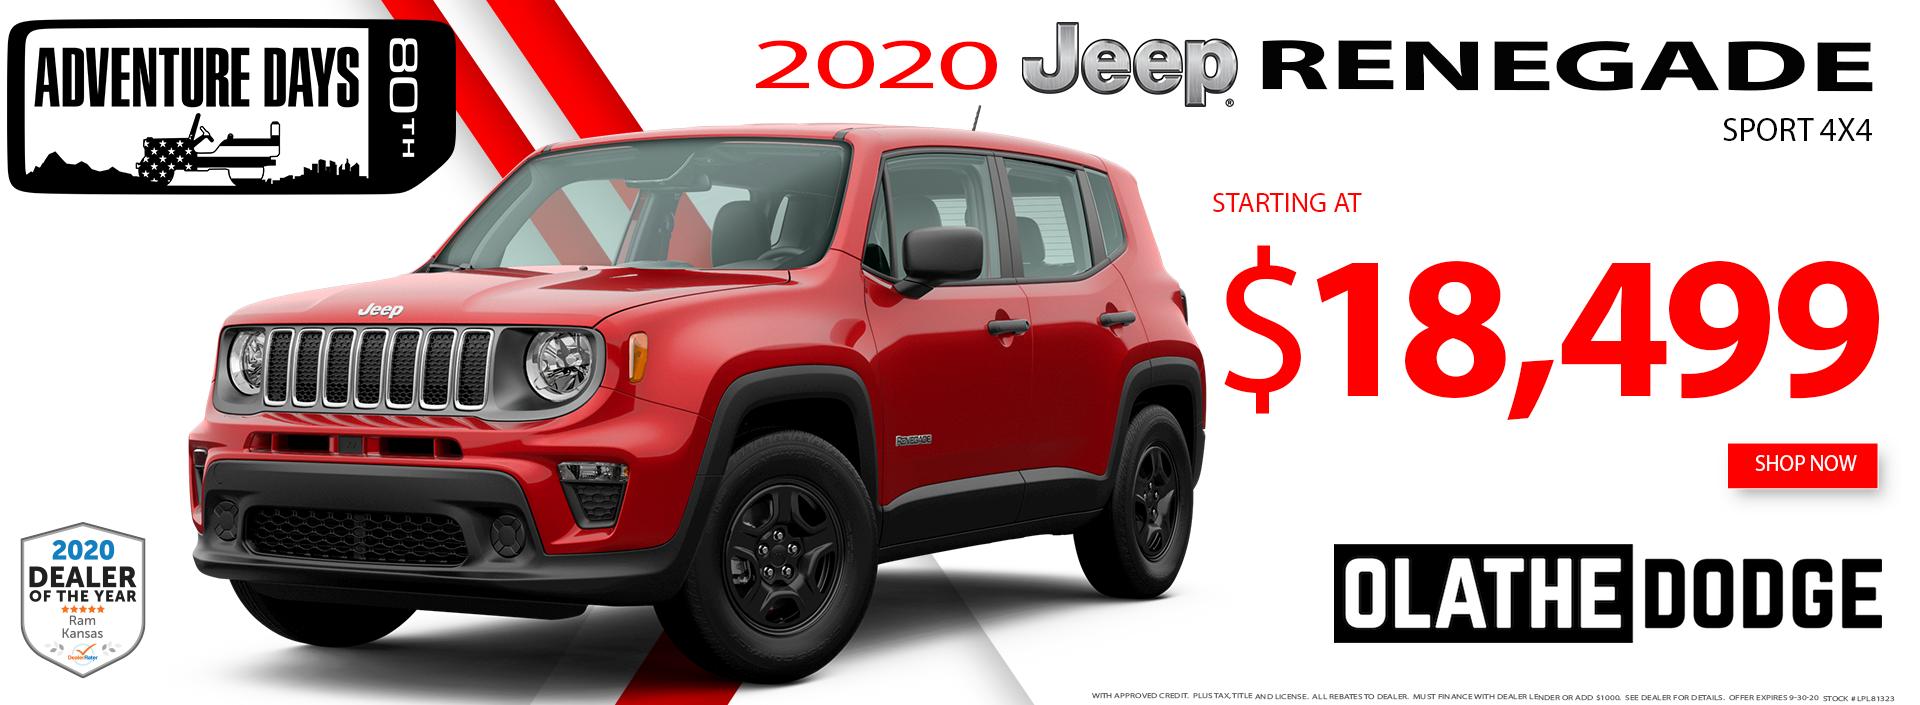 9.4.2020–Olathe Dodge–2020 Jeep Renegade 1920×705